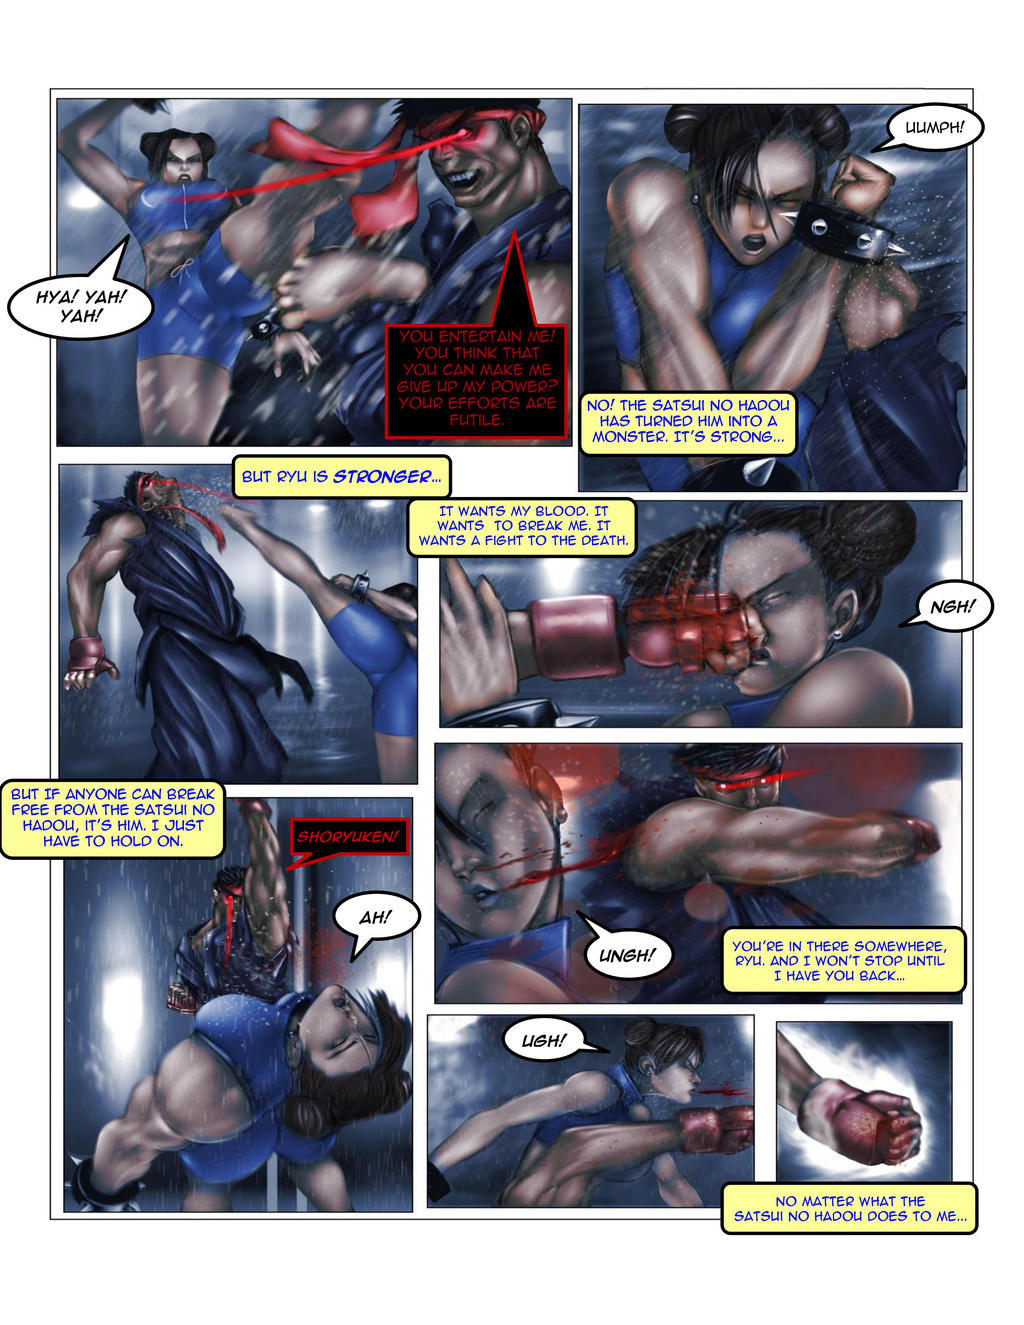 evil_ryu_vs_chun_li_pg_2_by_tree_ink-d9ulw6f.jpg